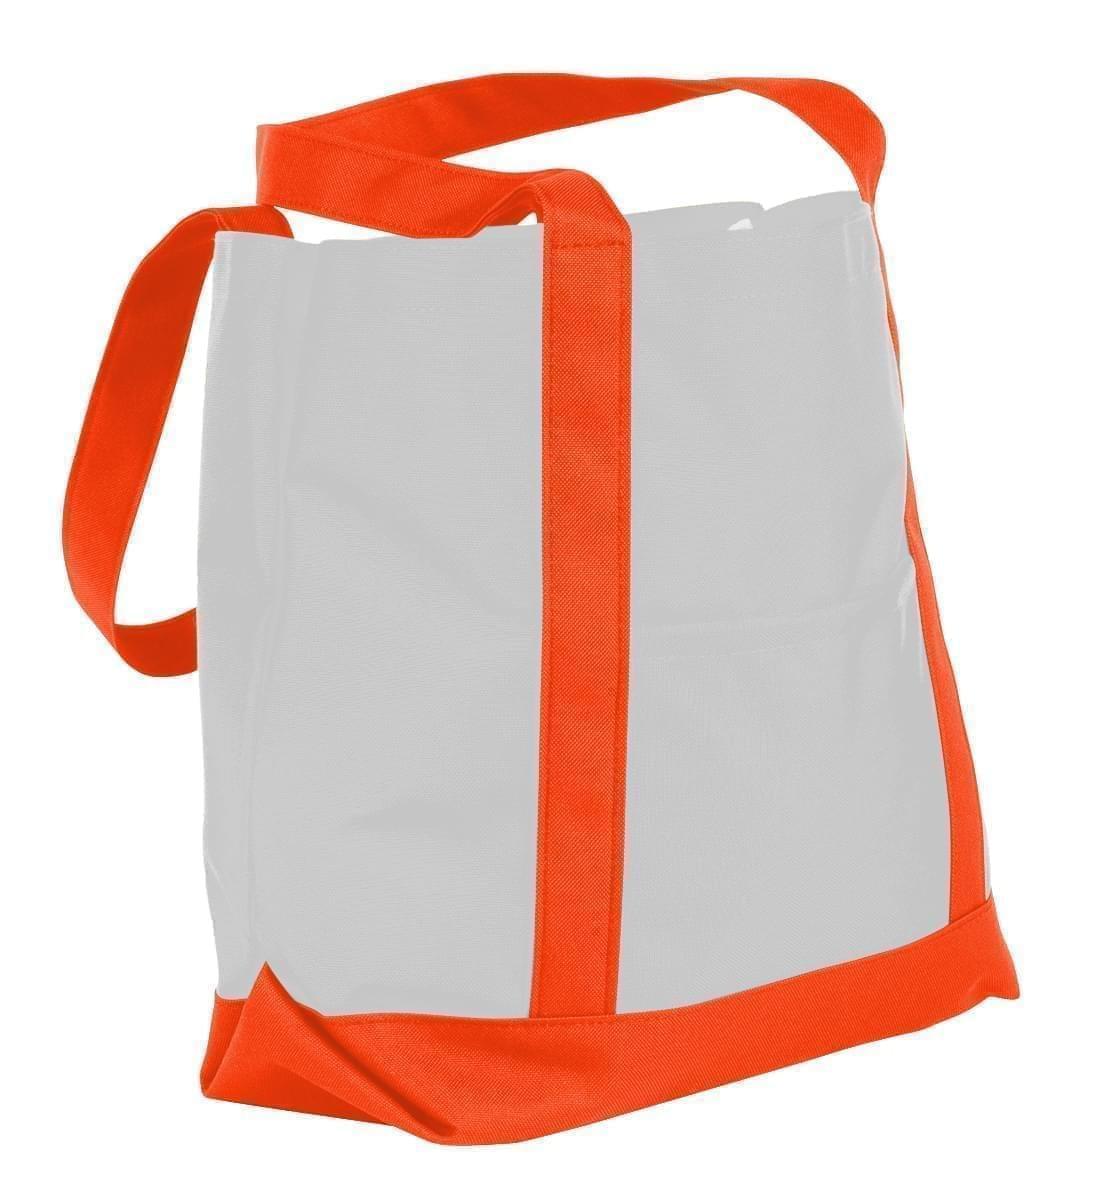 USA Made Nylon Poly Boat Tote Bags, White-Orange, XAACL1UA3J